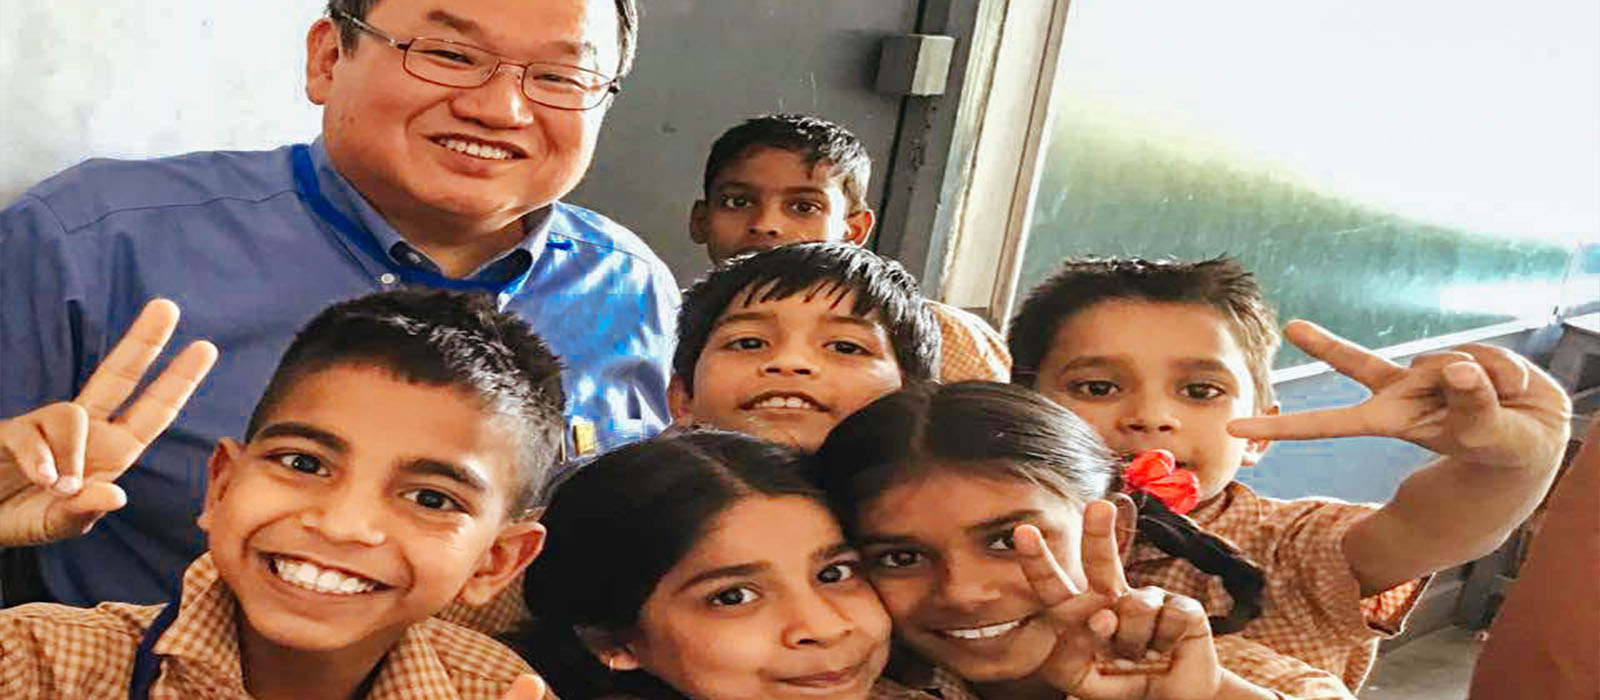 MAP_CEO_Steve_Stirling_in_India_Polio.jpg